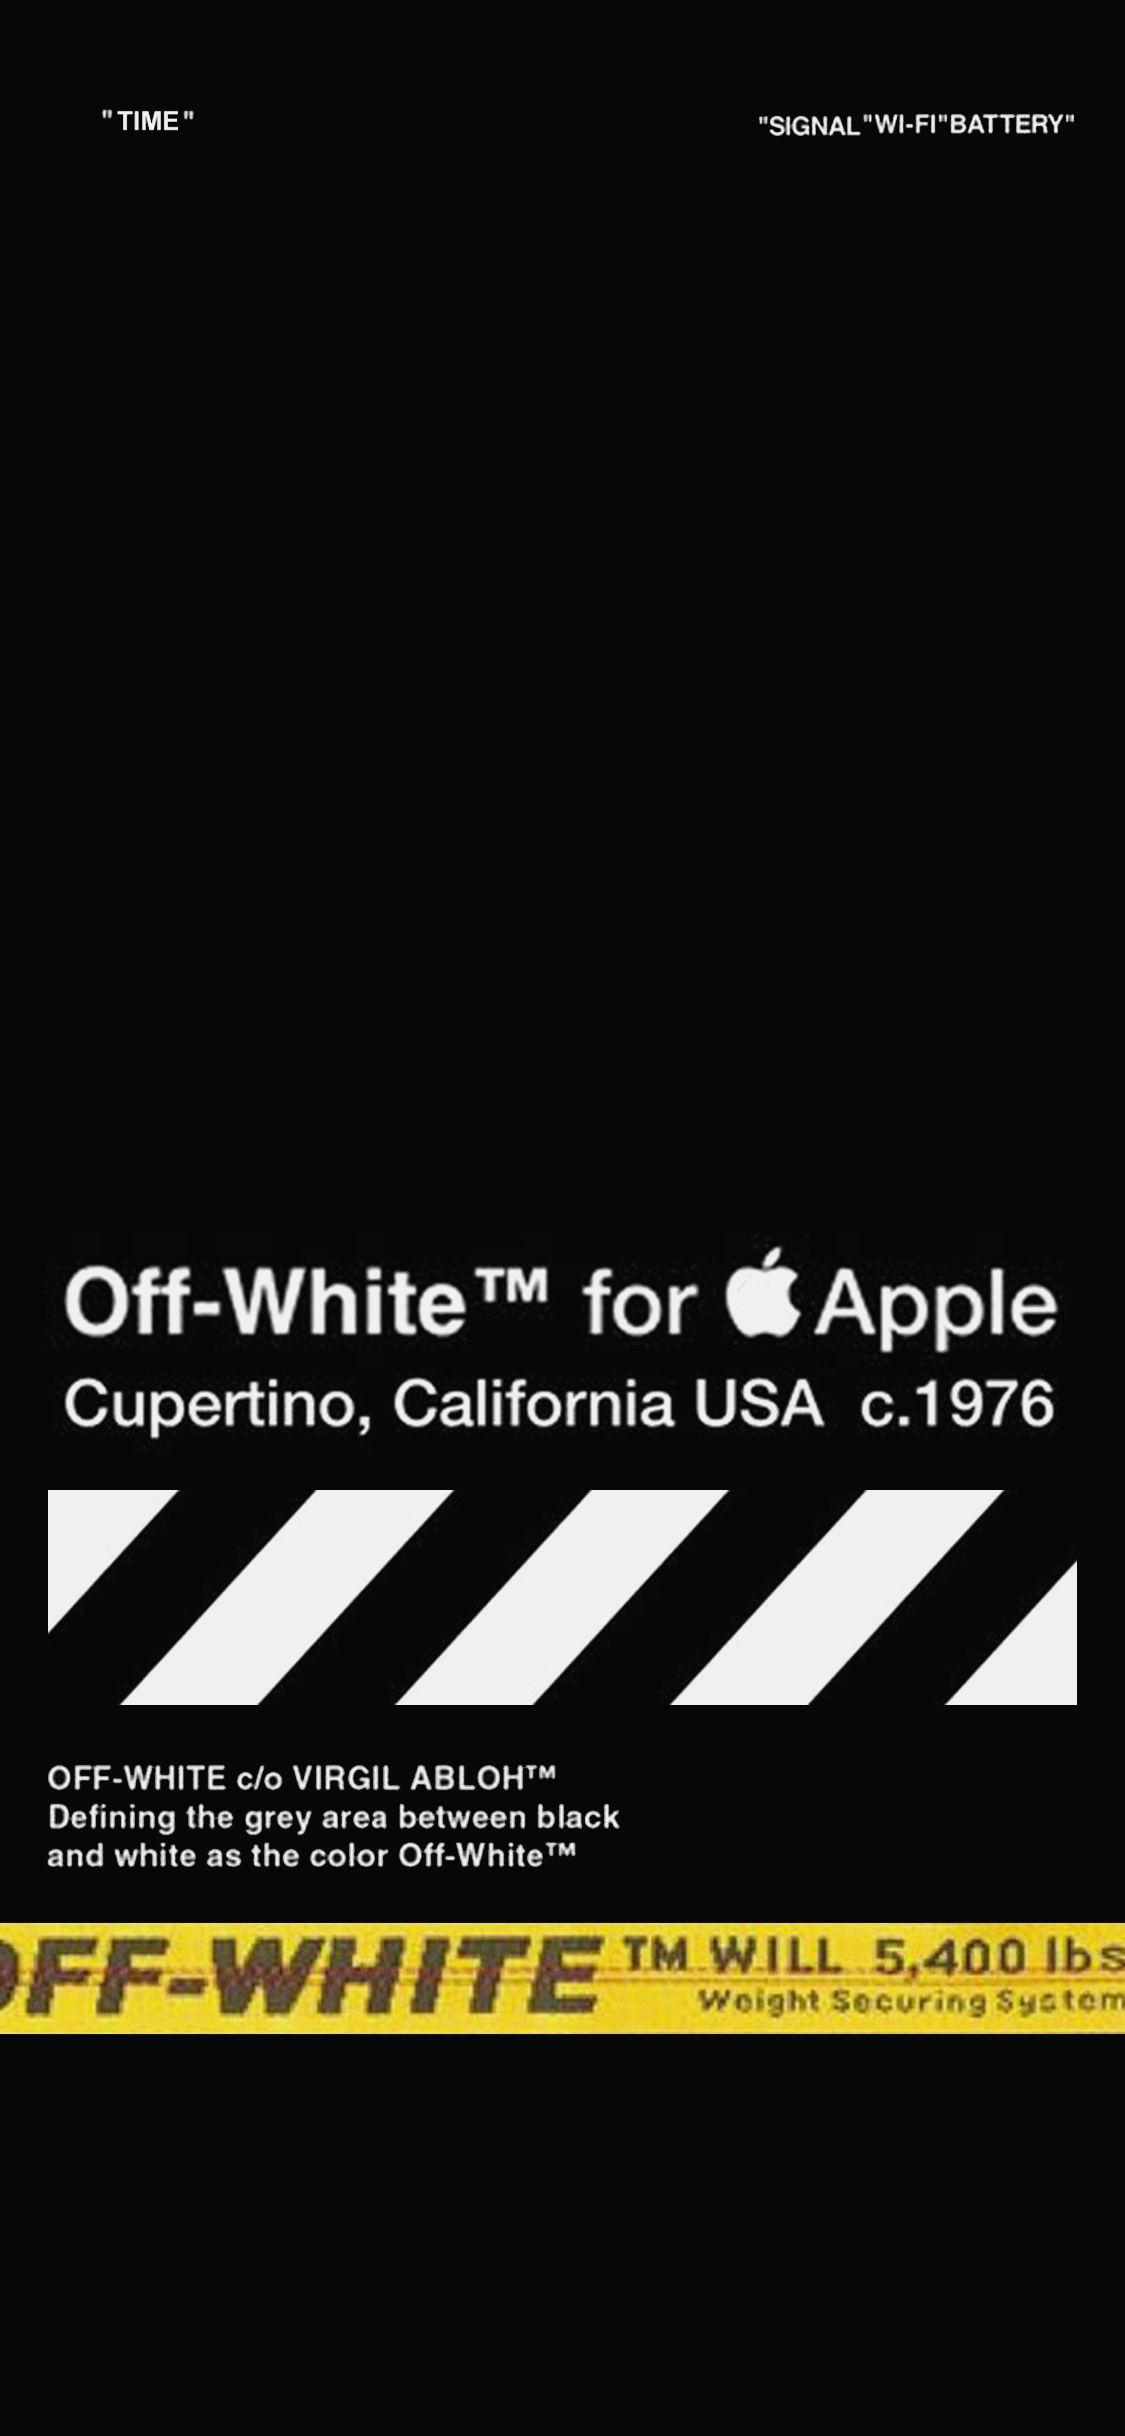 10 Supreme Wallpaper Hd Iphone X Off White Wallpaper Iphone X 1125x2436 Wallpaper Teahub Io